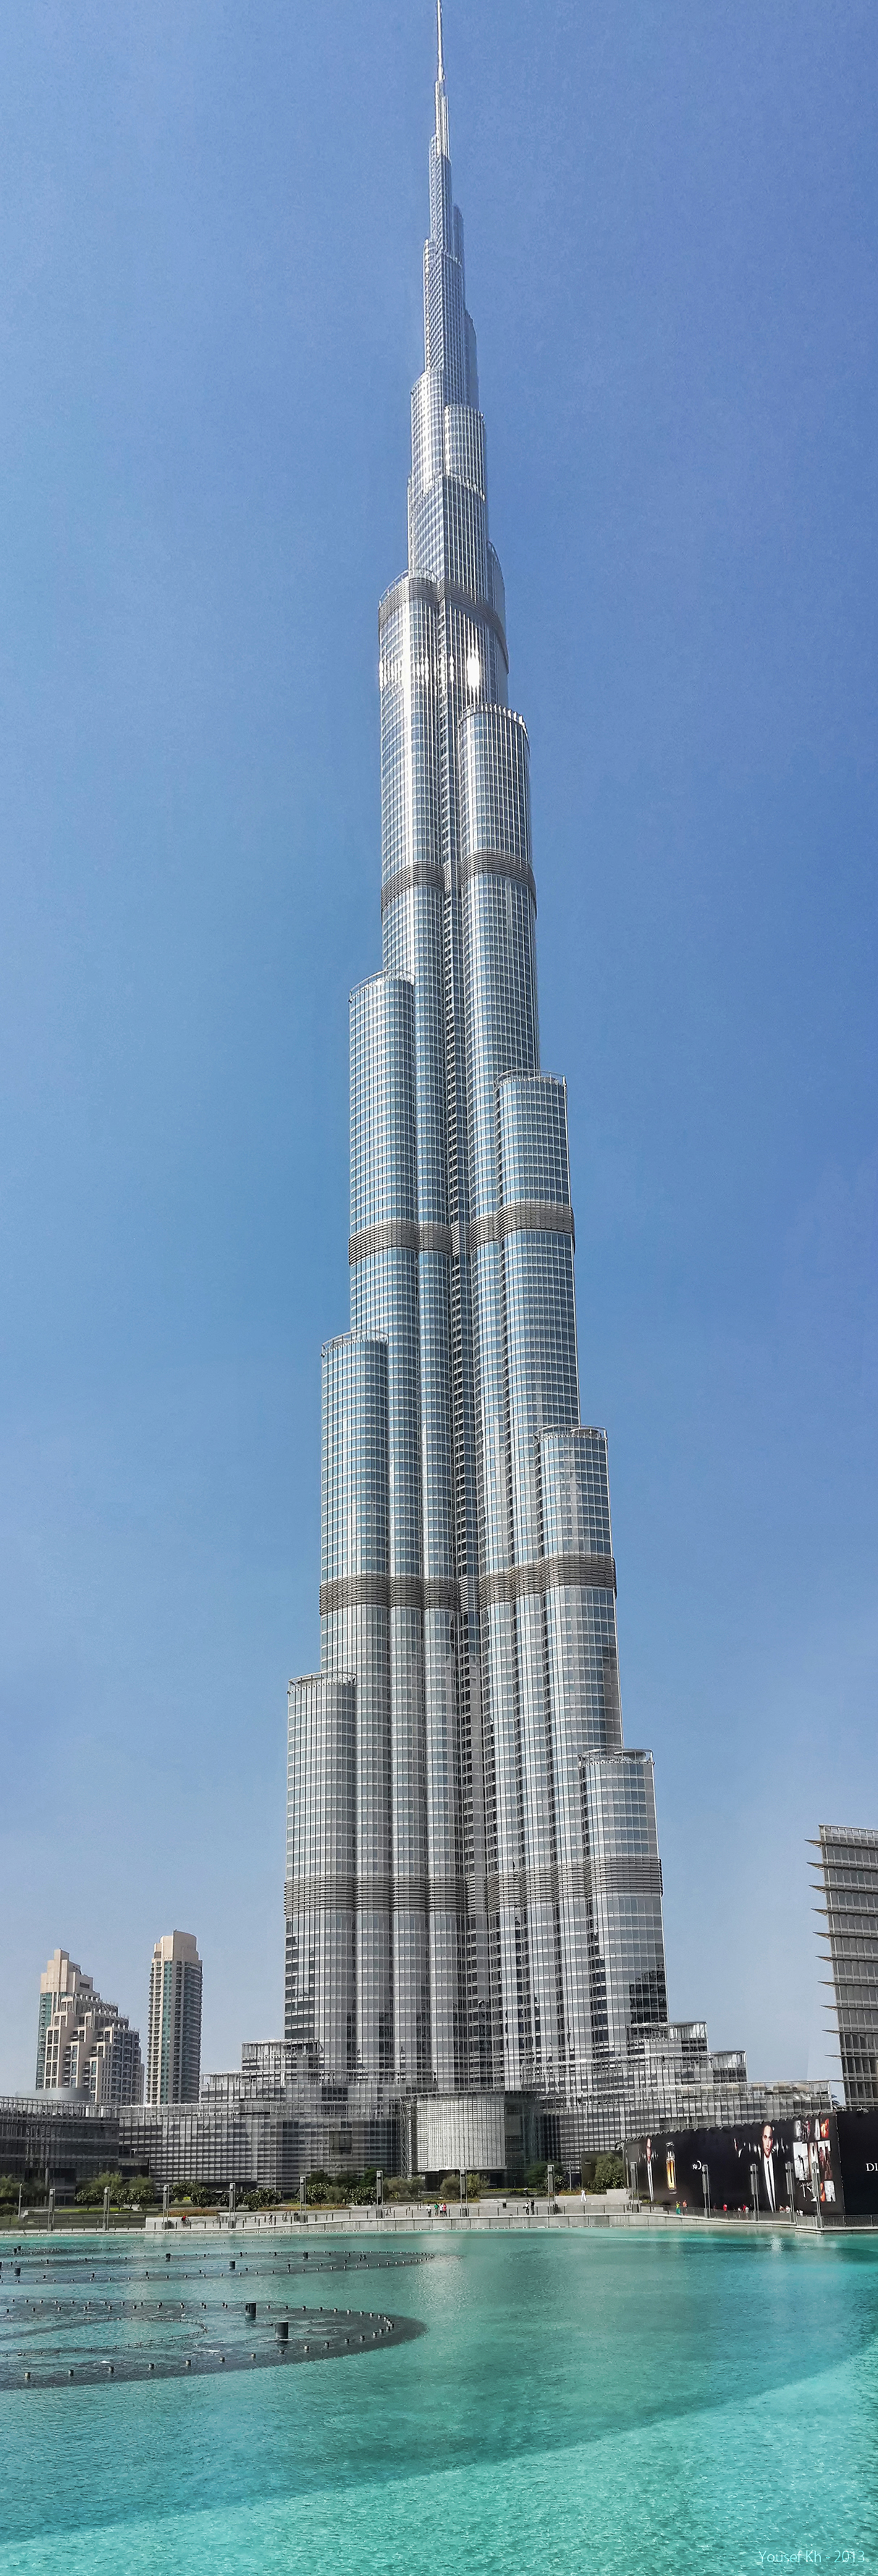 Burj Khalifa HDR by yousefcia